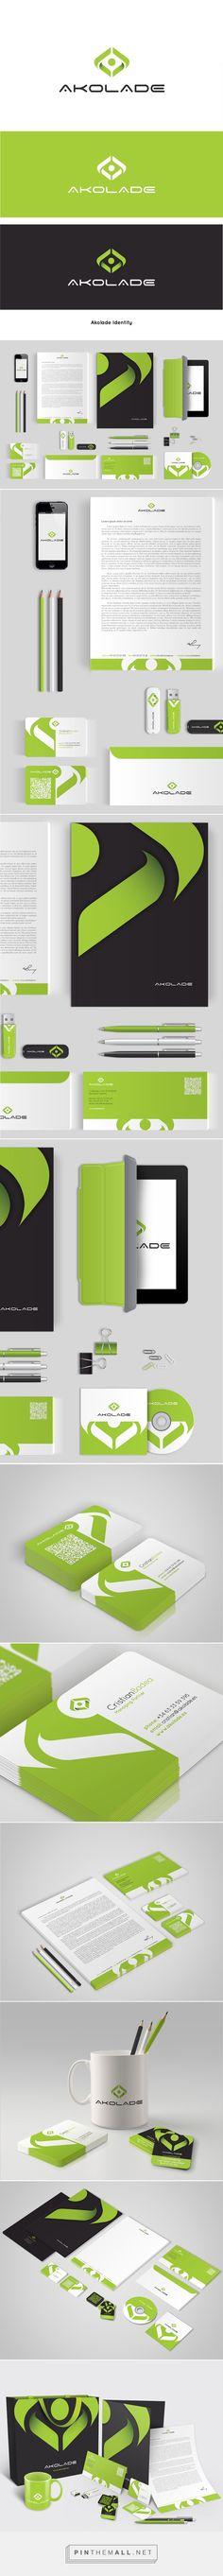 Akolade Invest Consulting Branding on Behance   Fivestar Branding – Design and Branding Agency & Inspiration Gallery   Professional Logo and Website Design